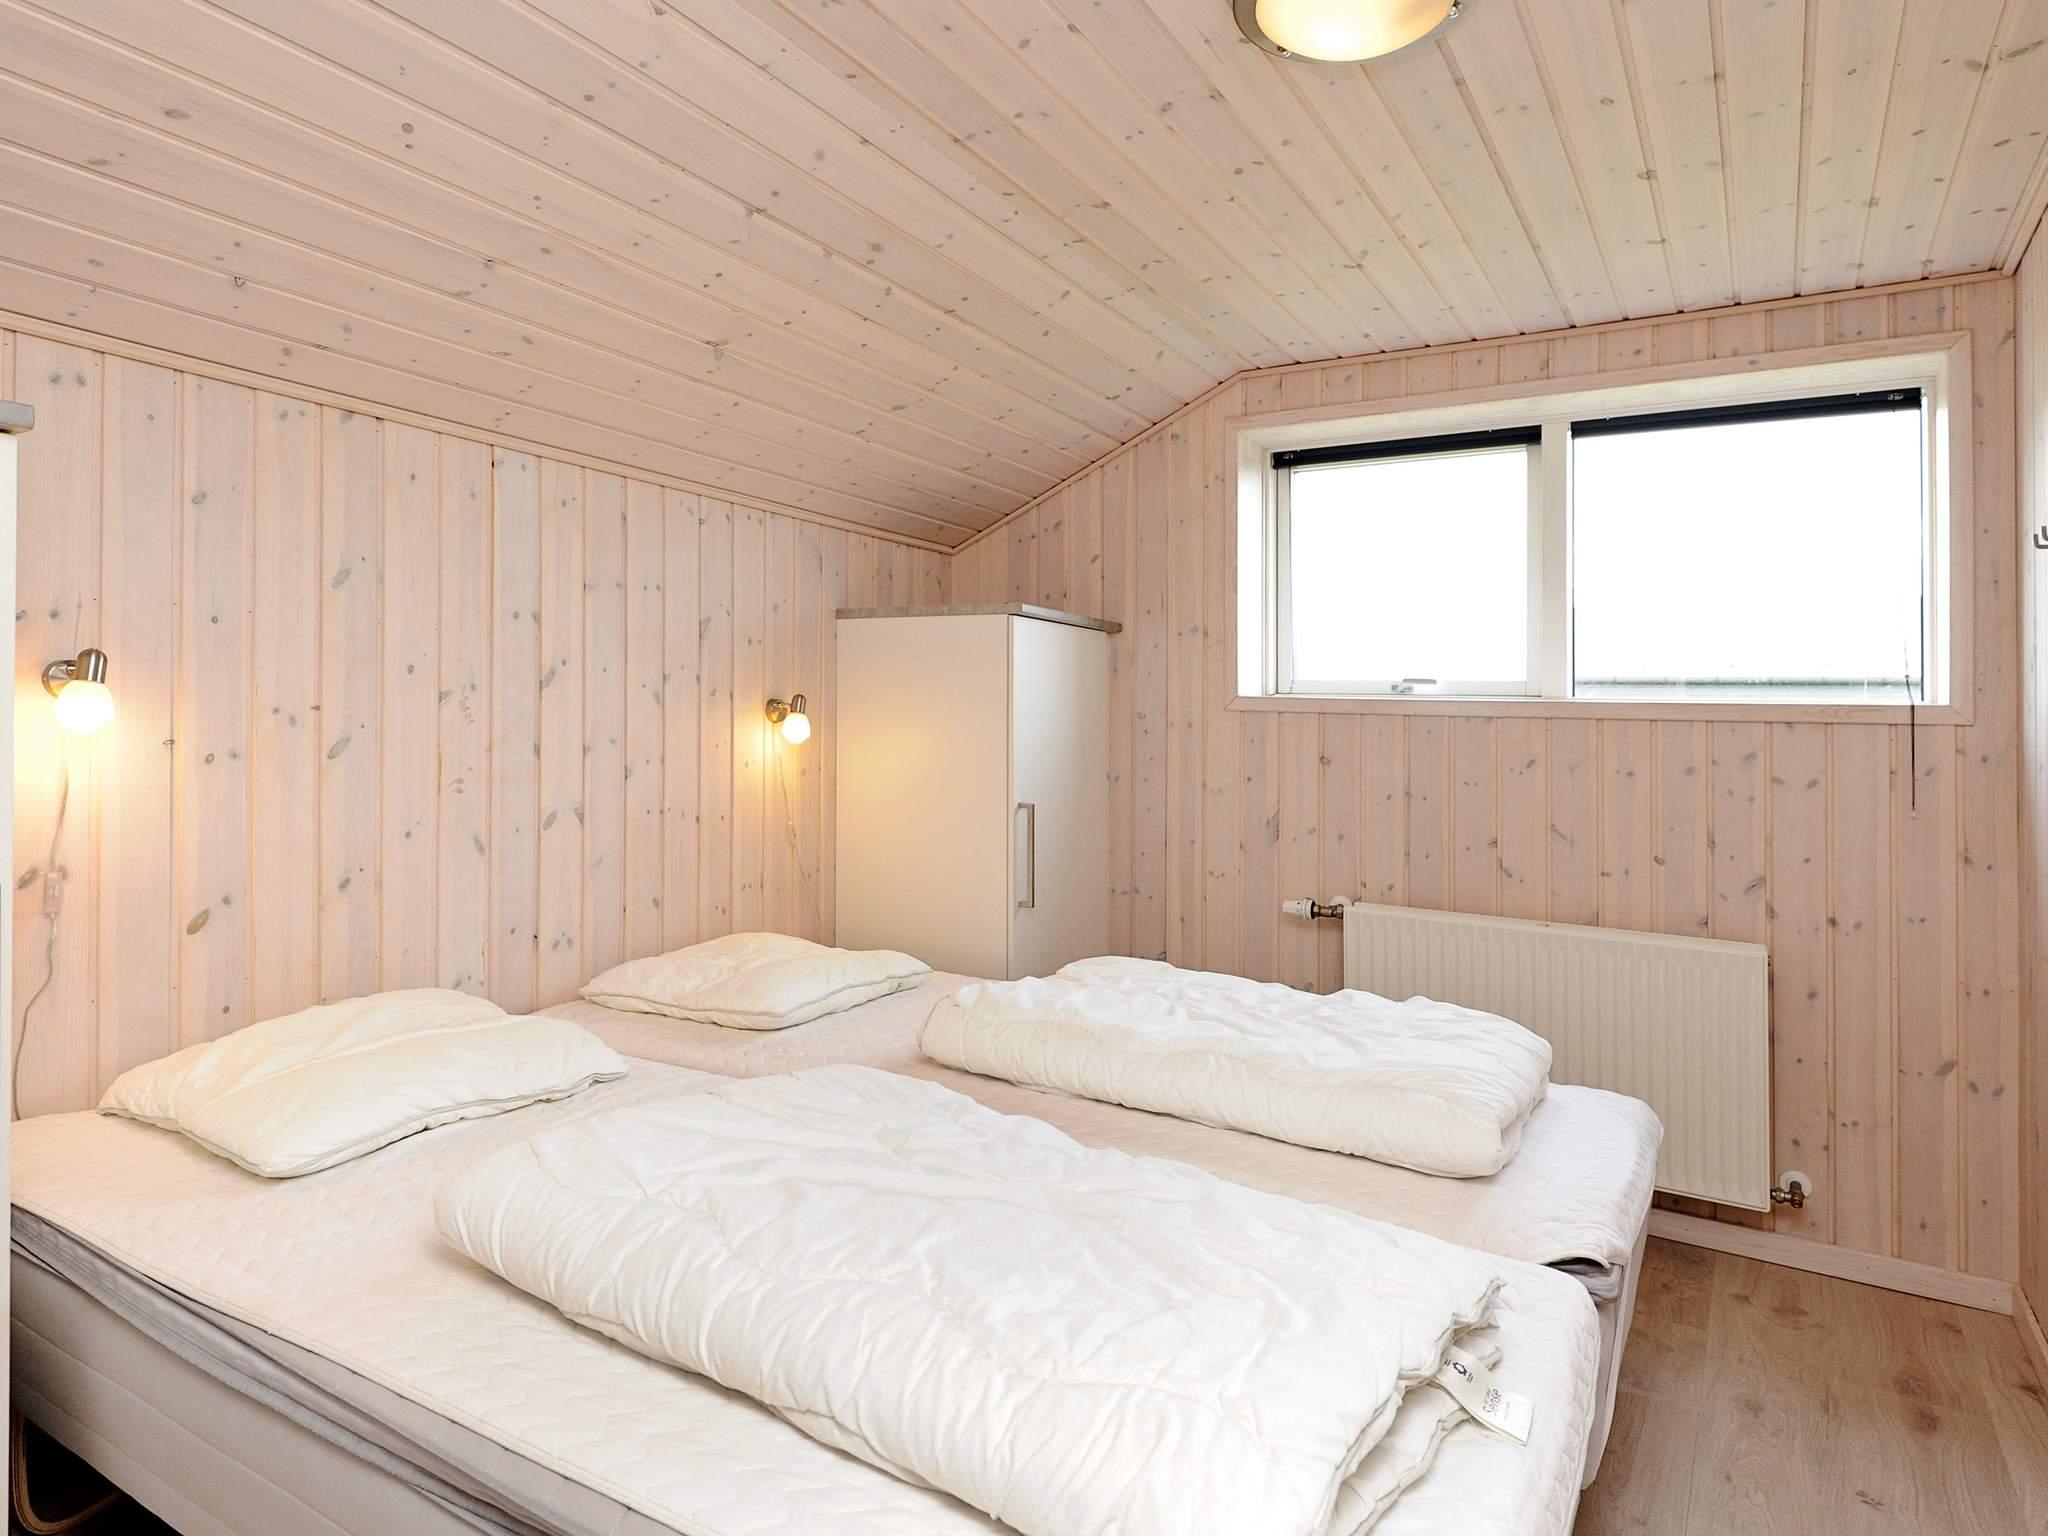 Ferienhaus Rømø/Havneby (437893), Rømø, , Südwestjütland, Dänemark, Bild 5